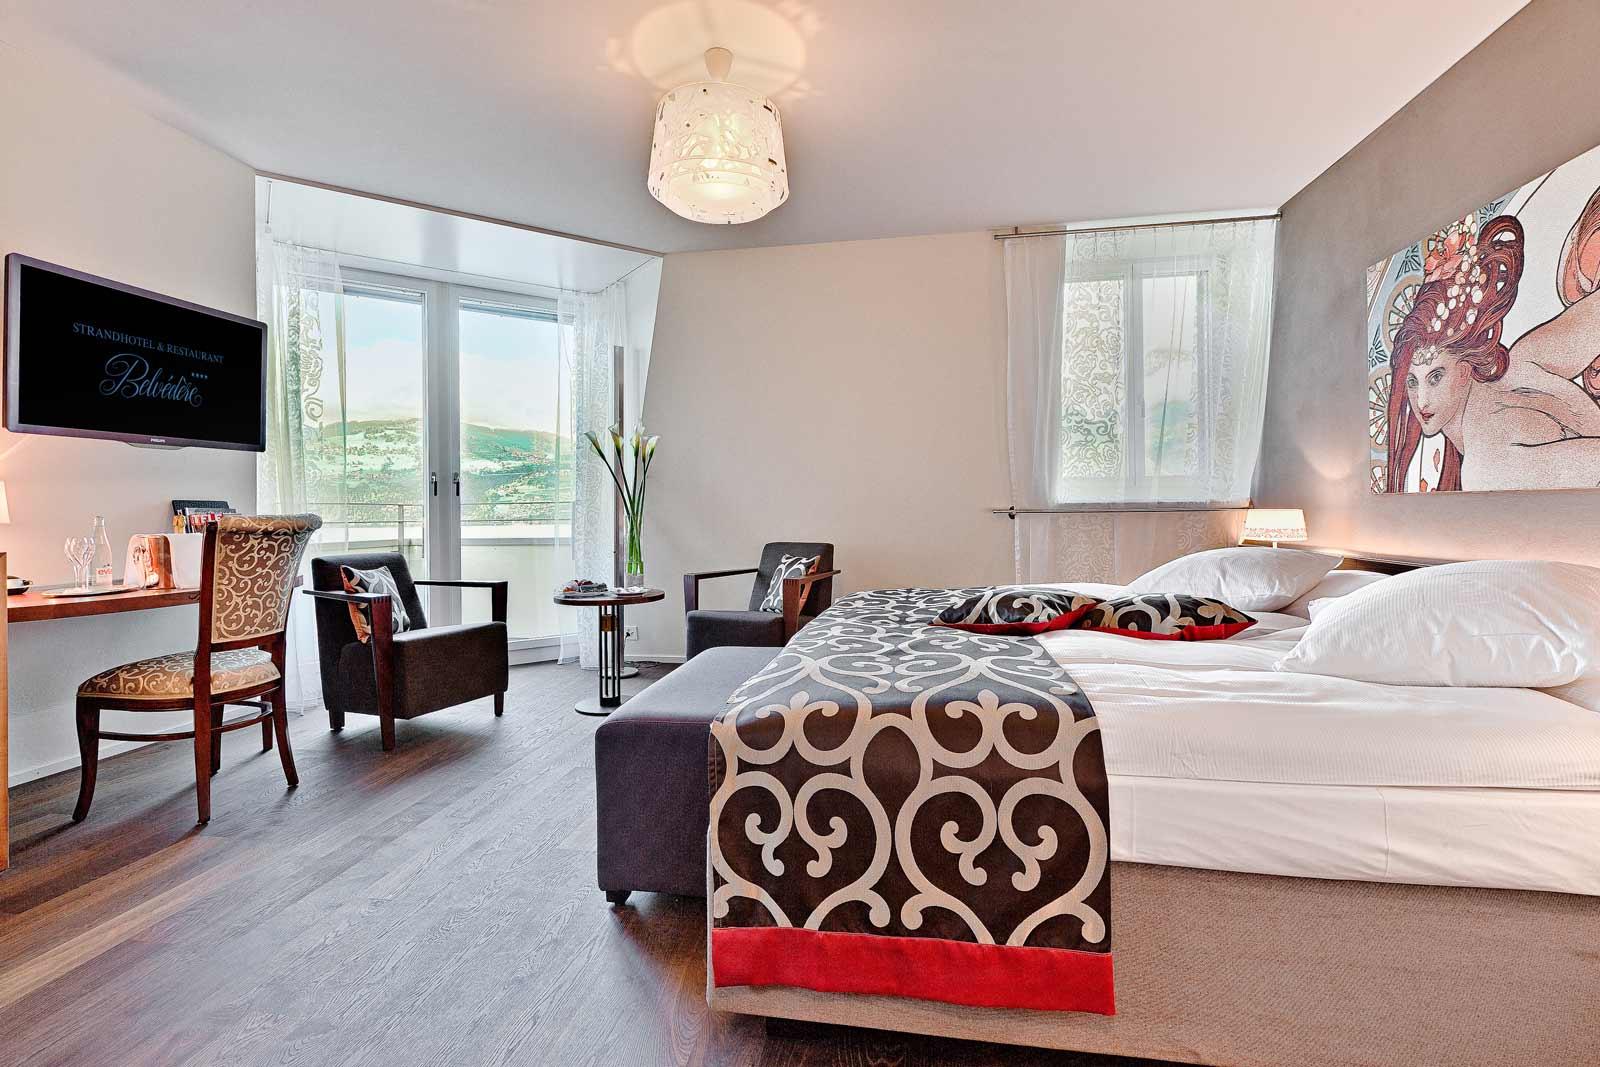 Hotel rooms in Belle Époque style